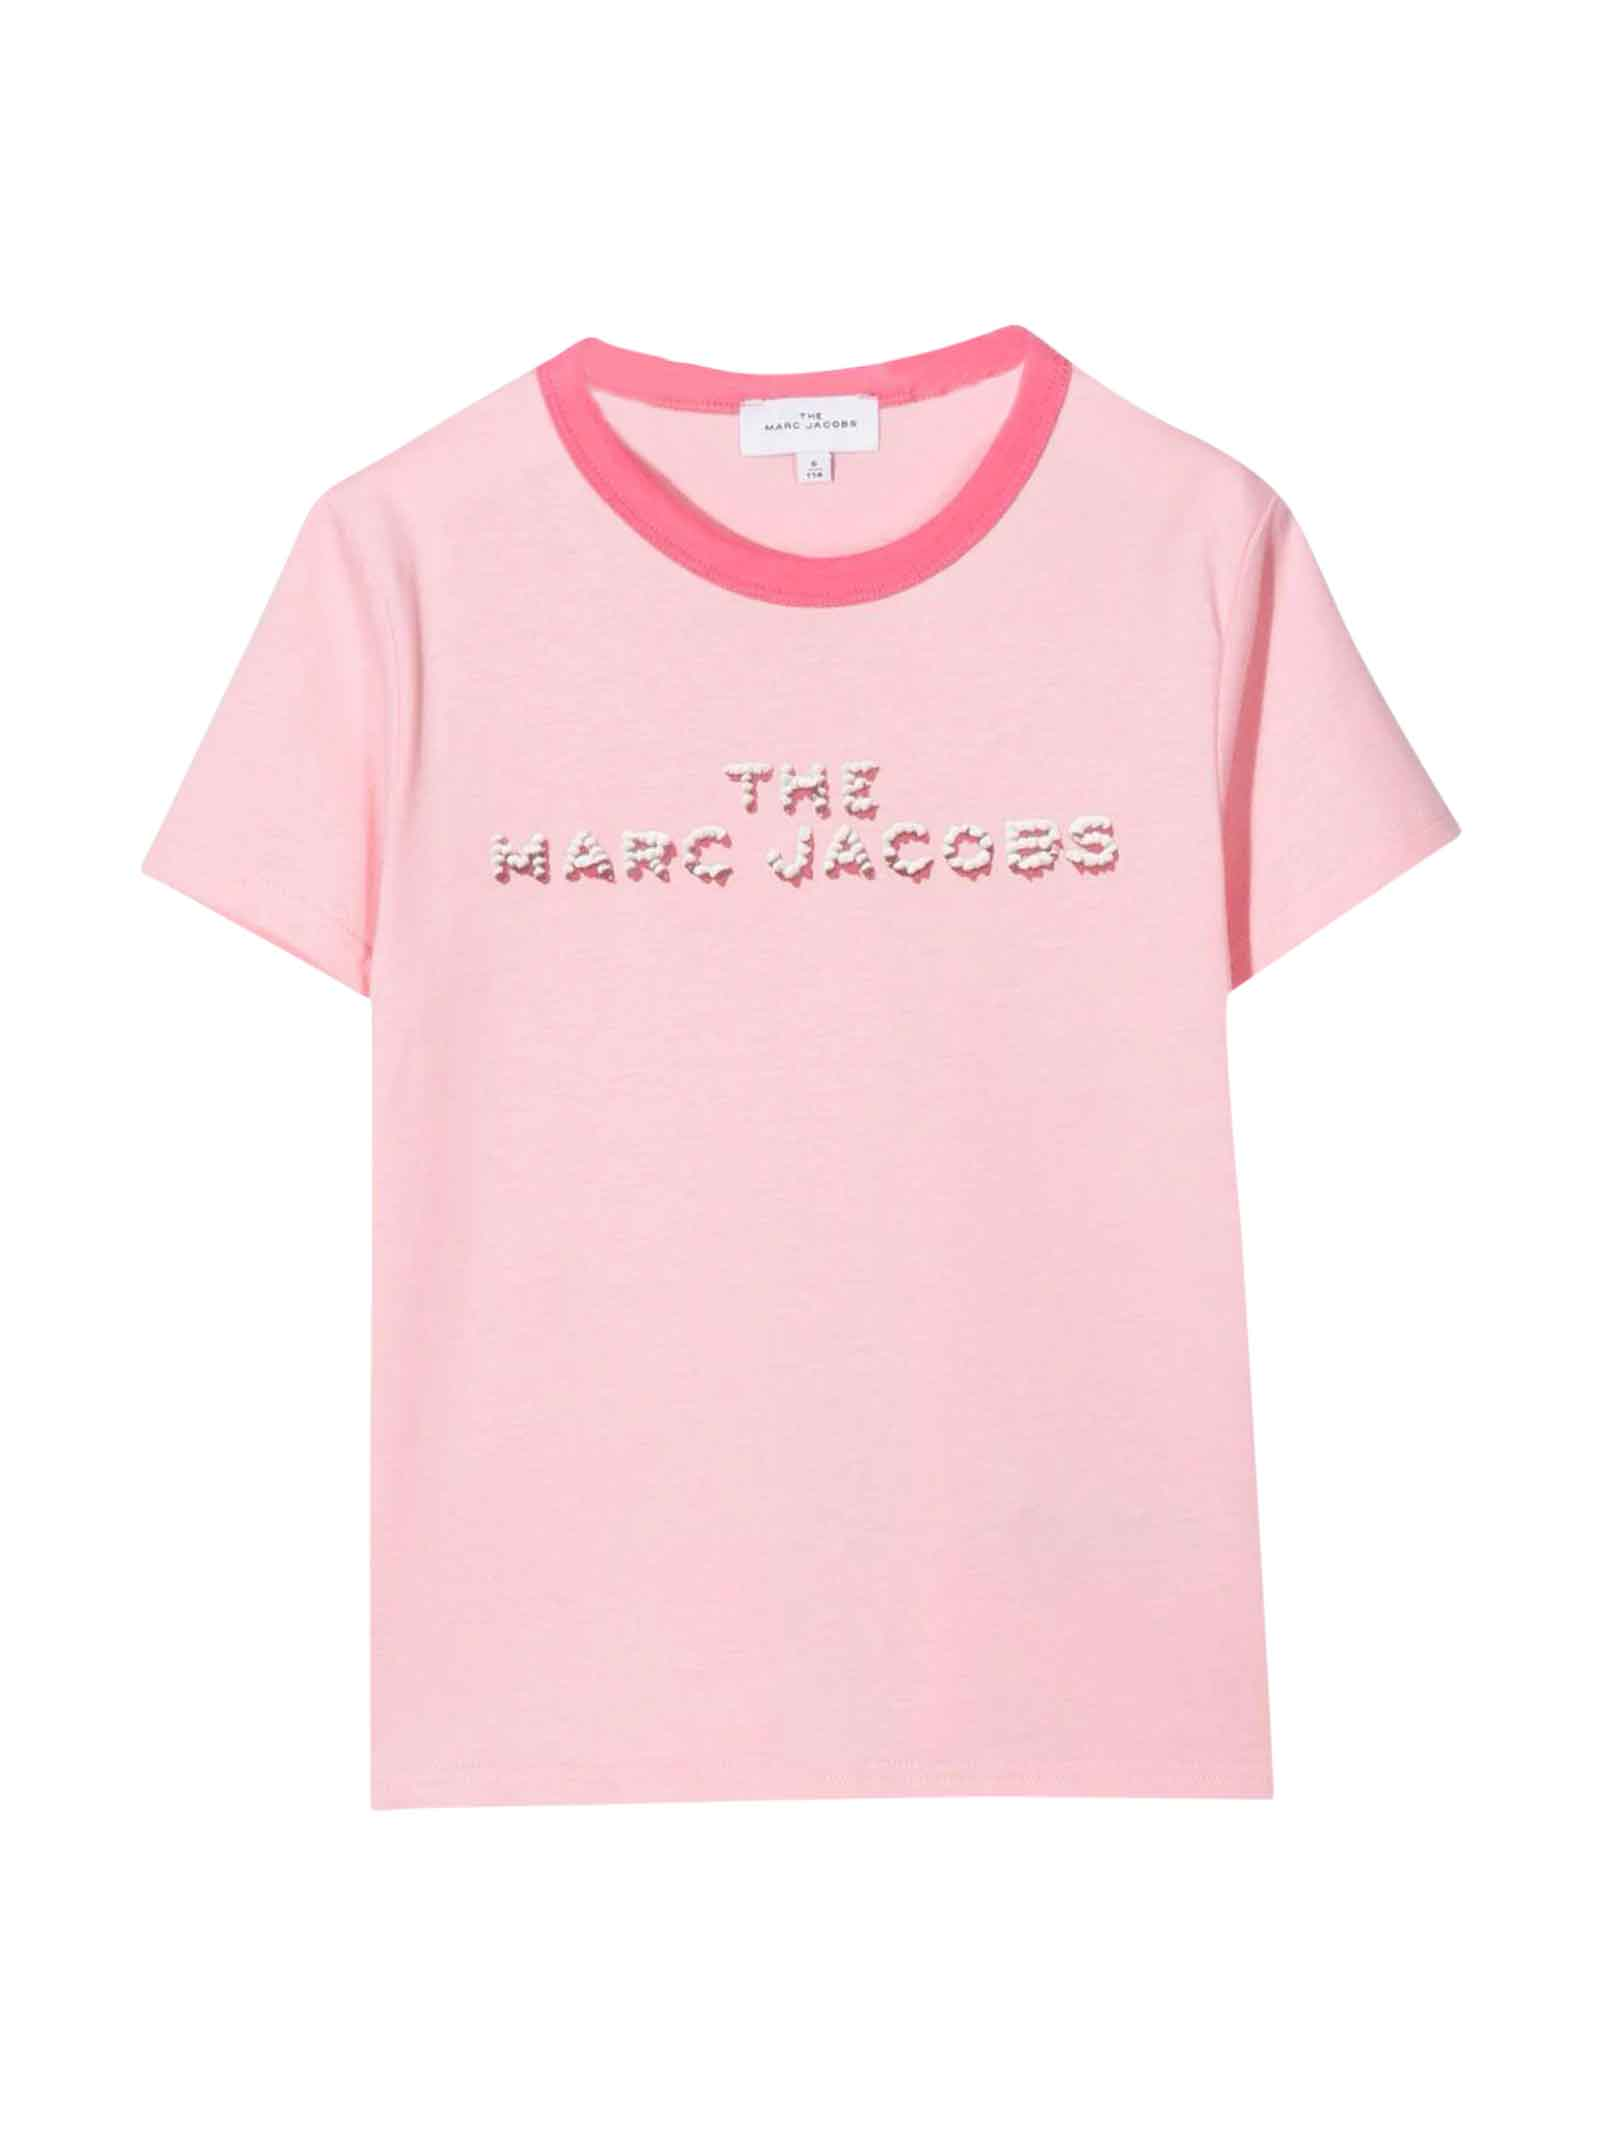 Unisex Pink T-shirt